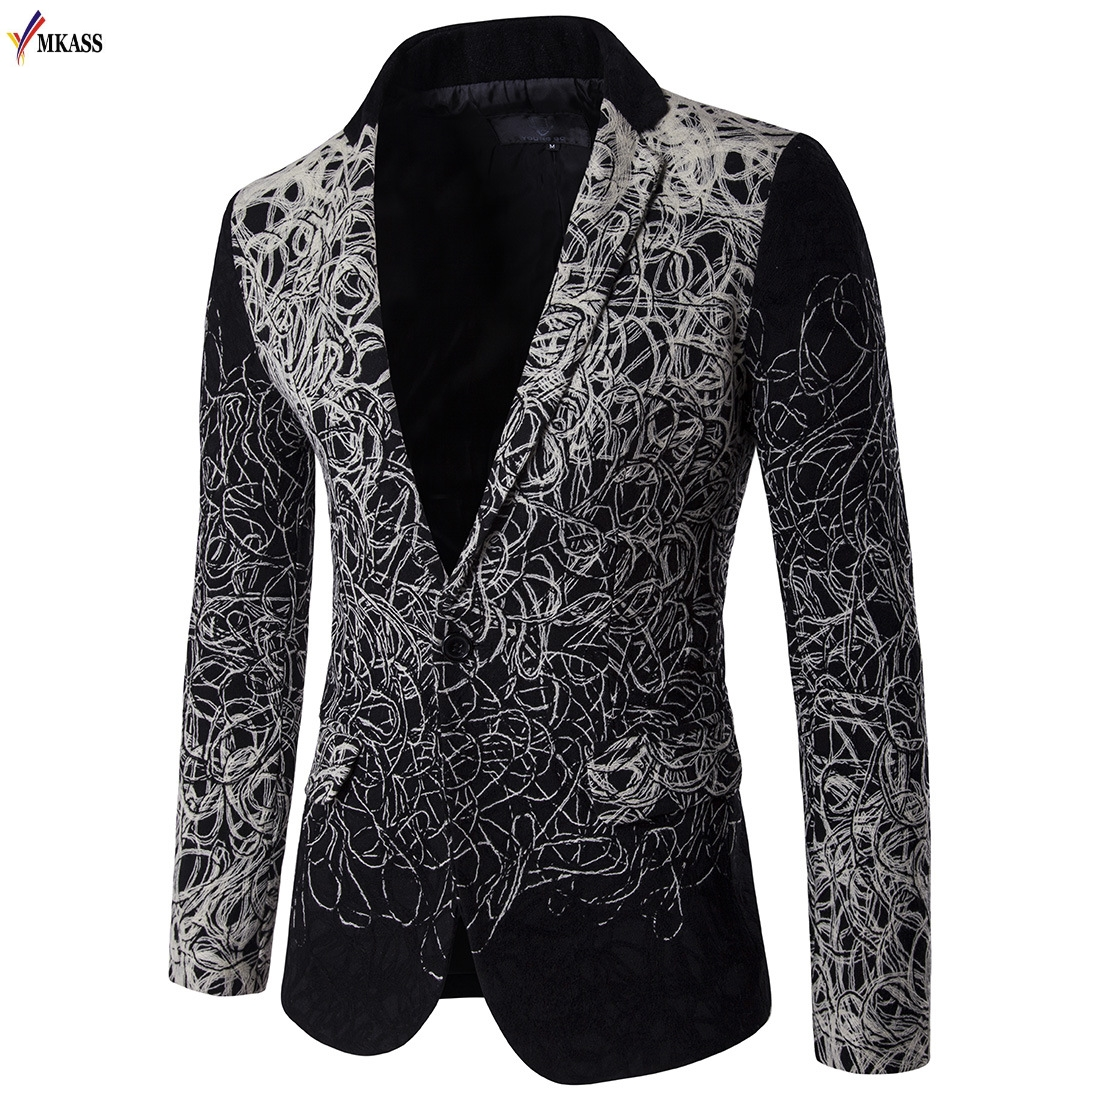 2017 Autumn Spring Mens Floral Blazer and Jackets Slim fit Fashion flower Wedding dress men blazer designs Suit men M-5XL